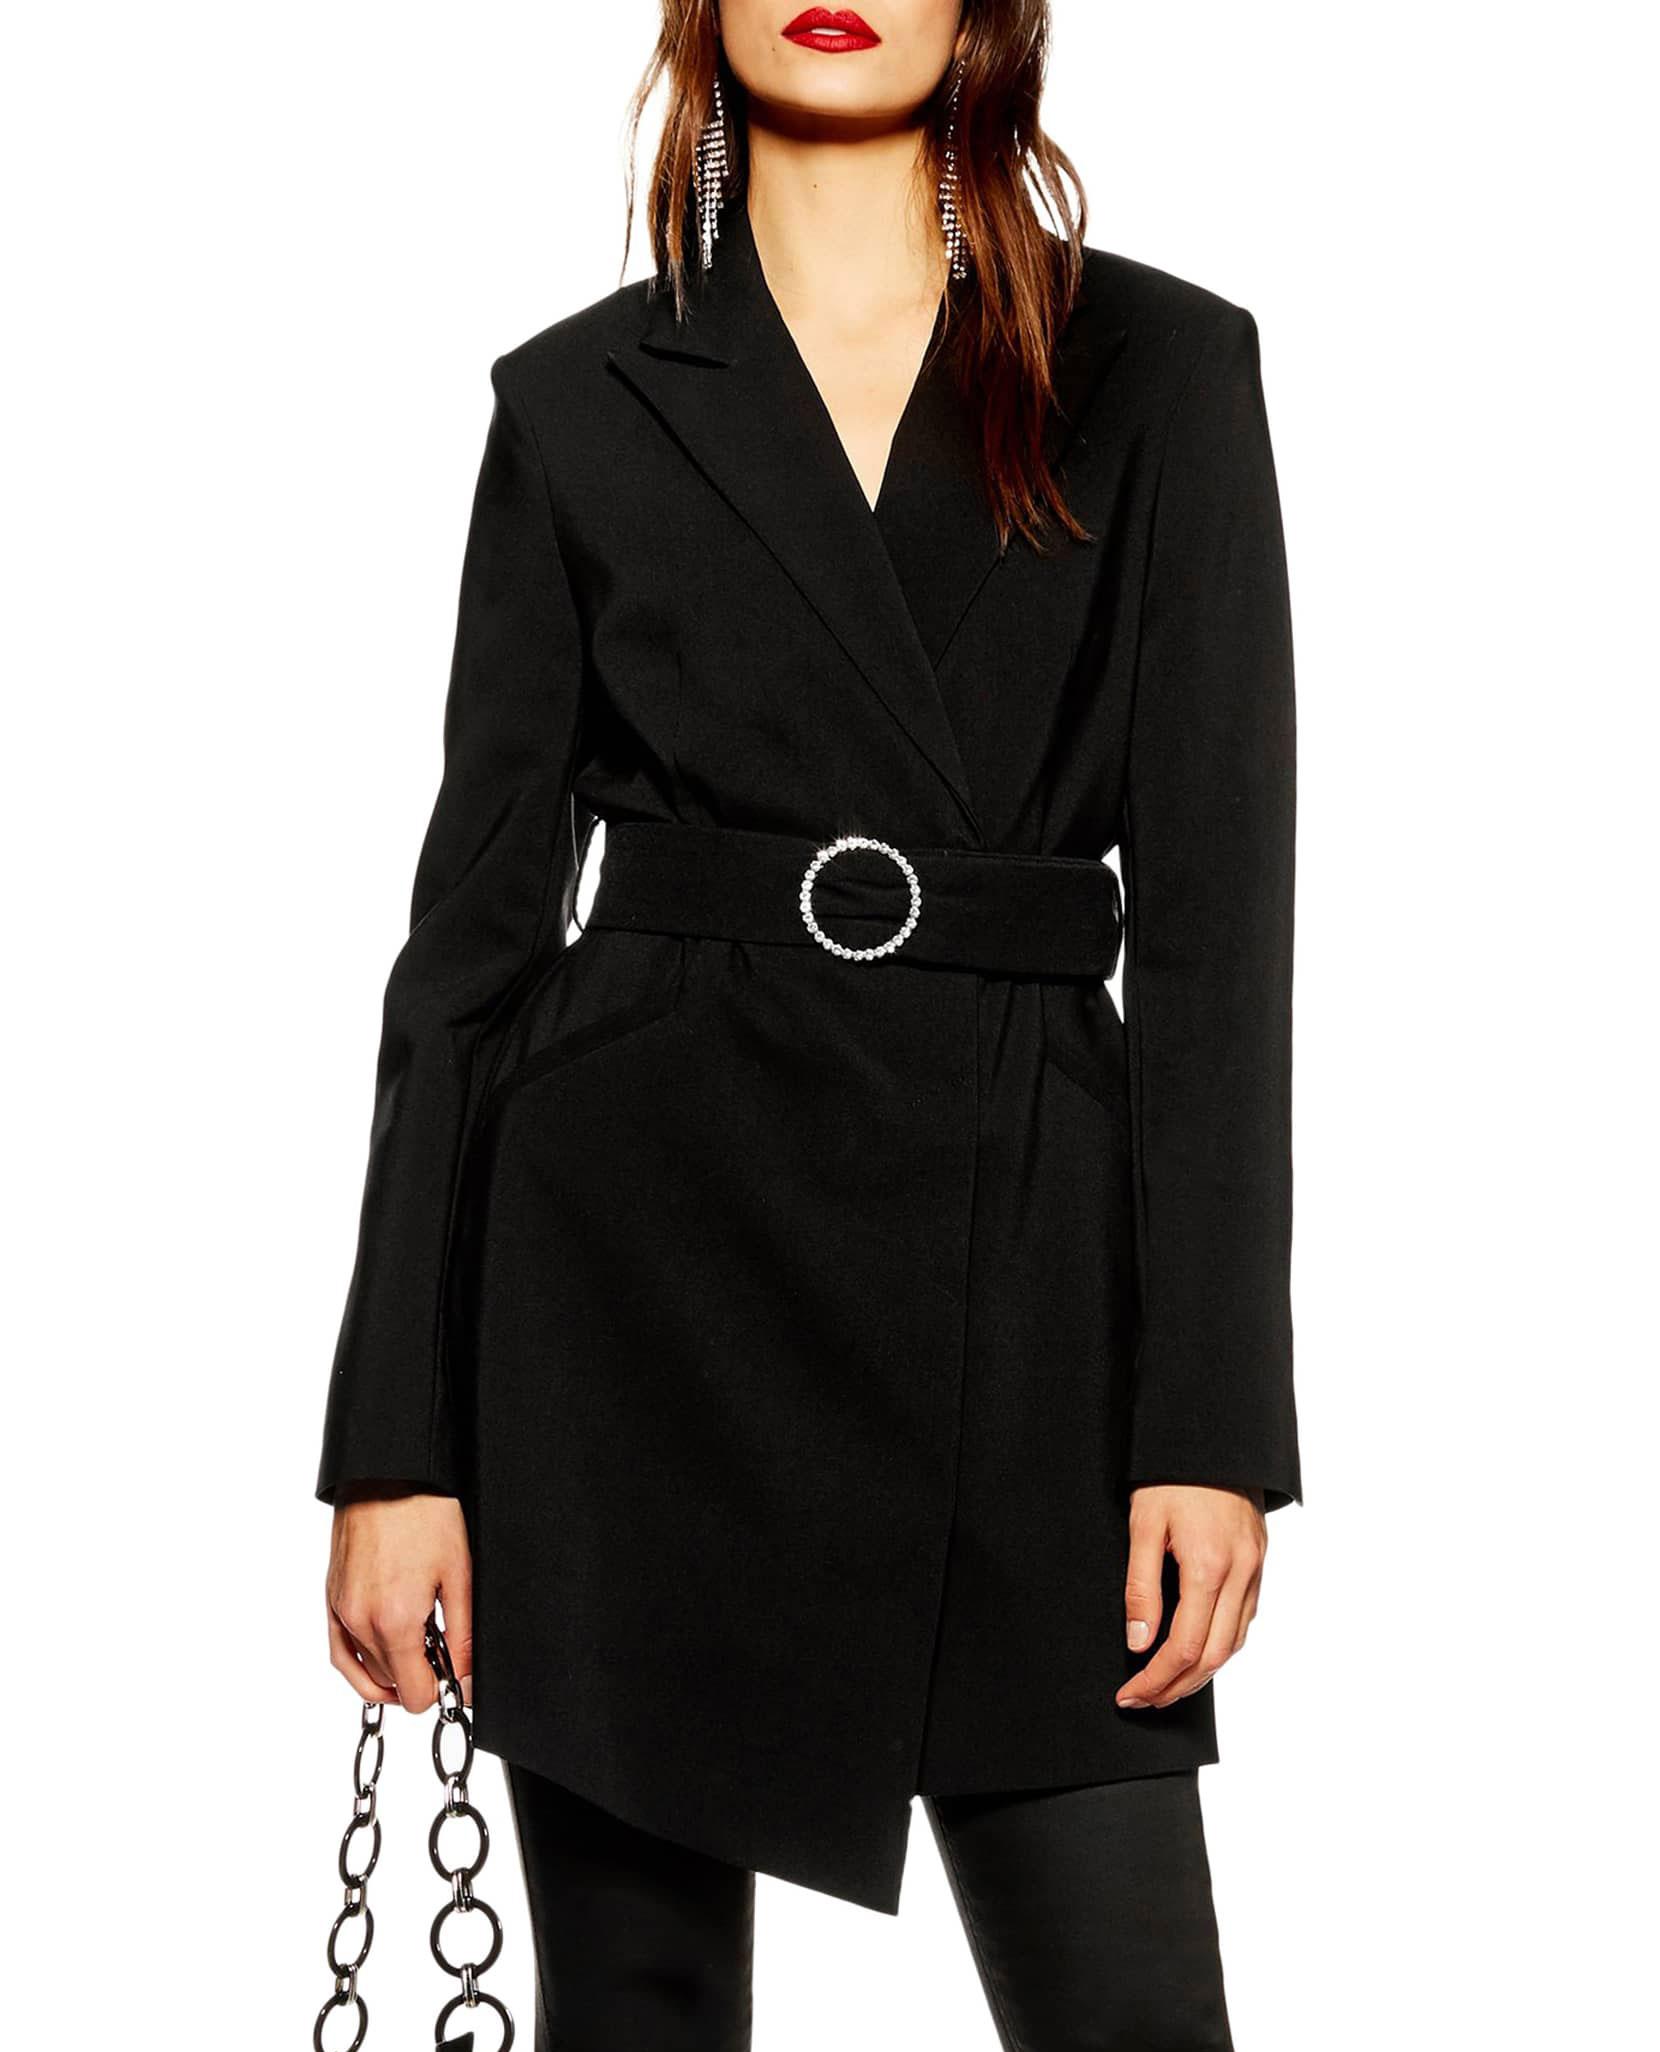 Topshop Blazer Dress     $125.00